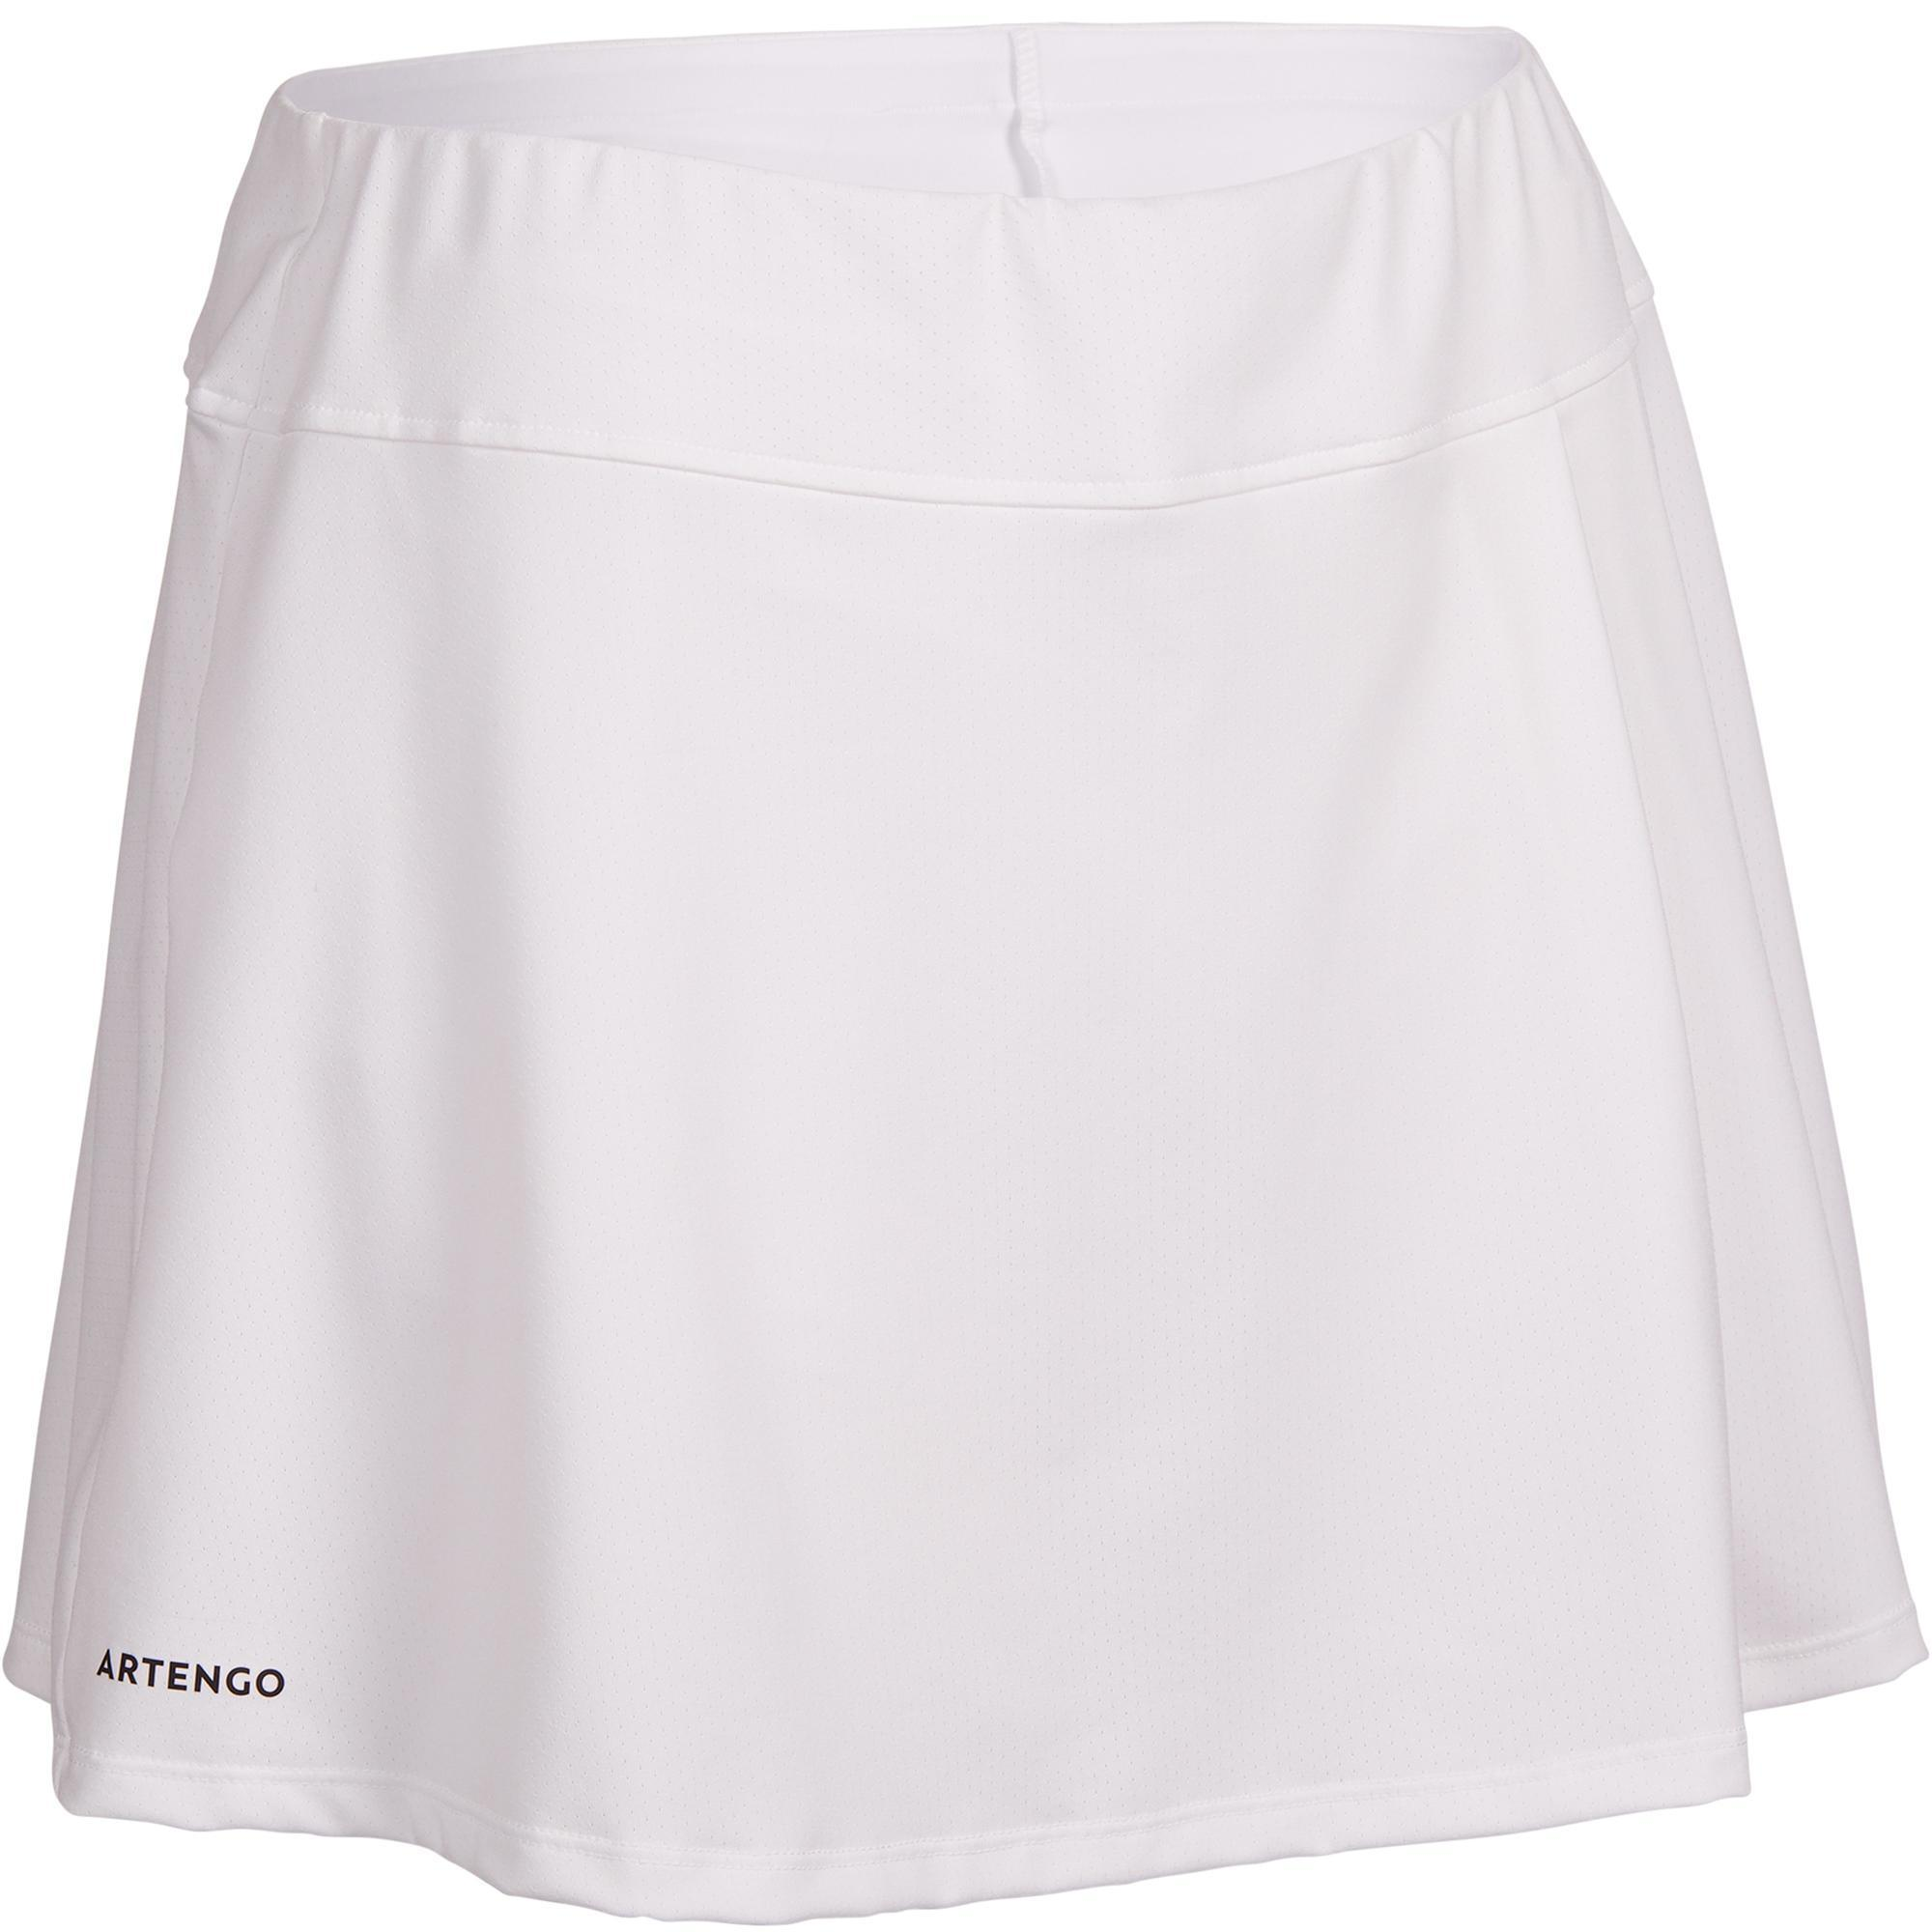 Tennisrock SK Soft 500 Damen weiß | Sportbekleidung > Sportröcke | Weiß | Artengo